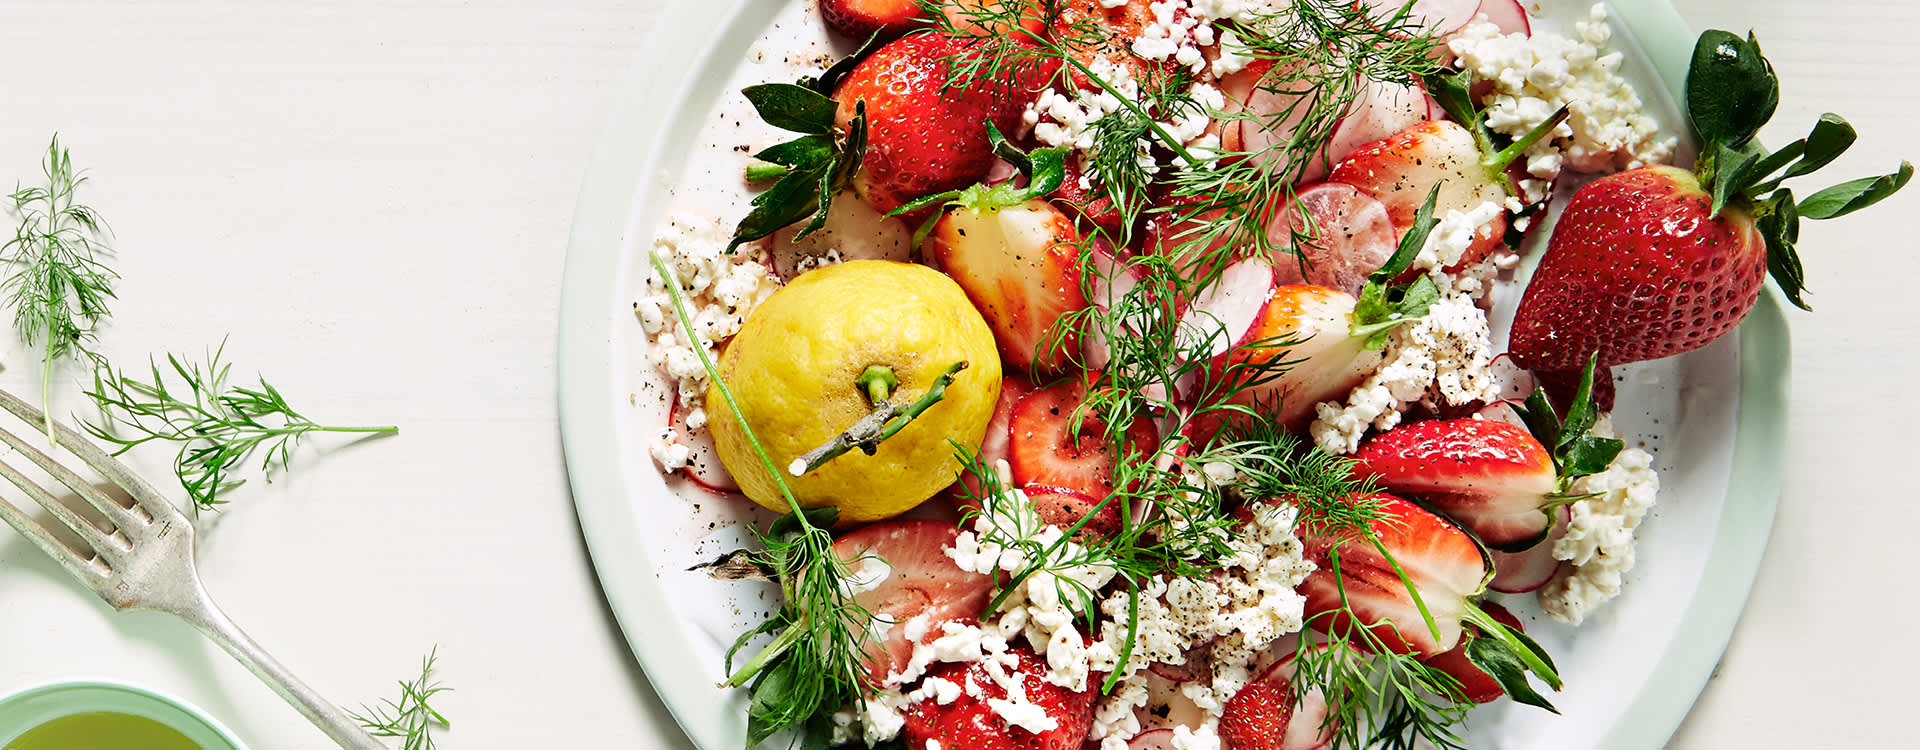 Prøv Tinas jordbærsalat med Tabasco neste gang!